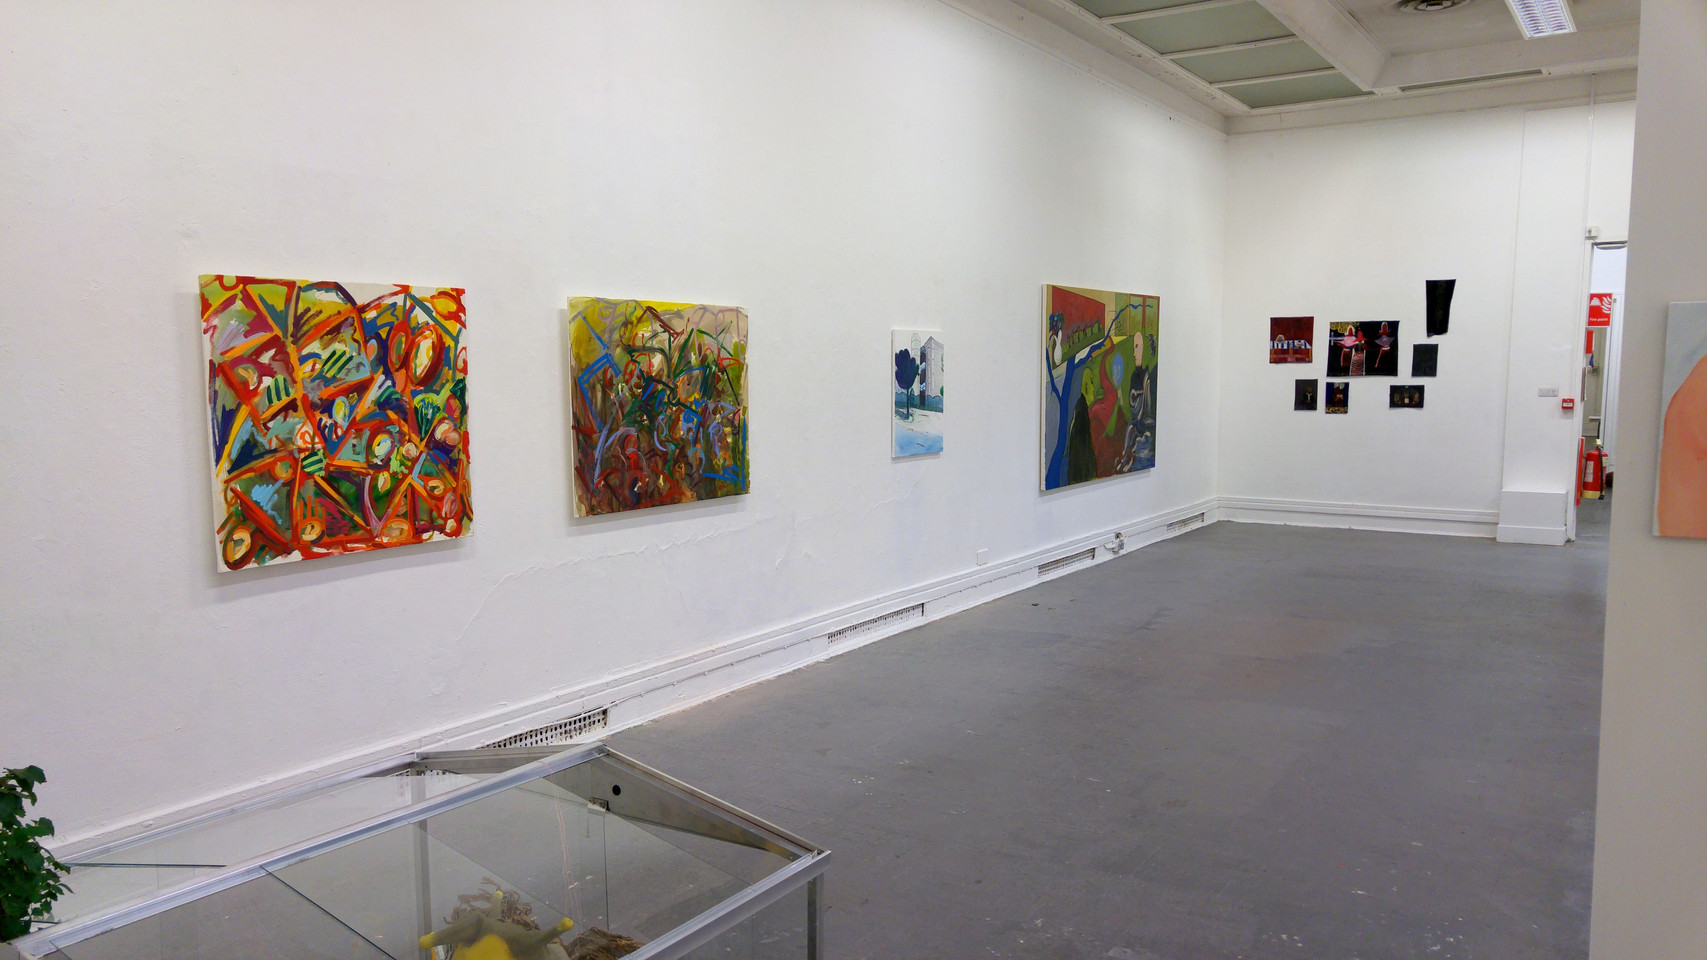 Jonathan Hurry, Zara Idelson, Jazmin Donaldson, Lara Shahnavaz